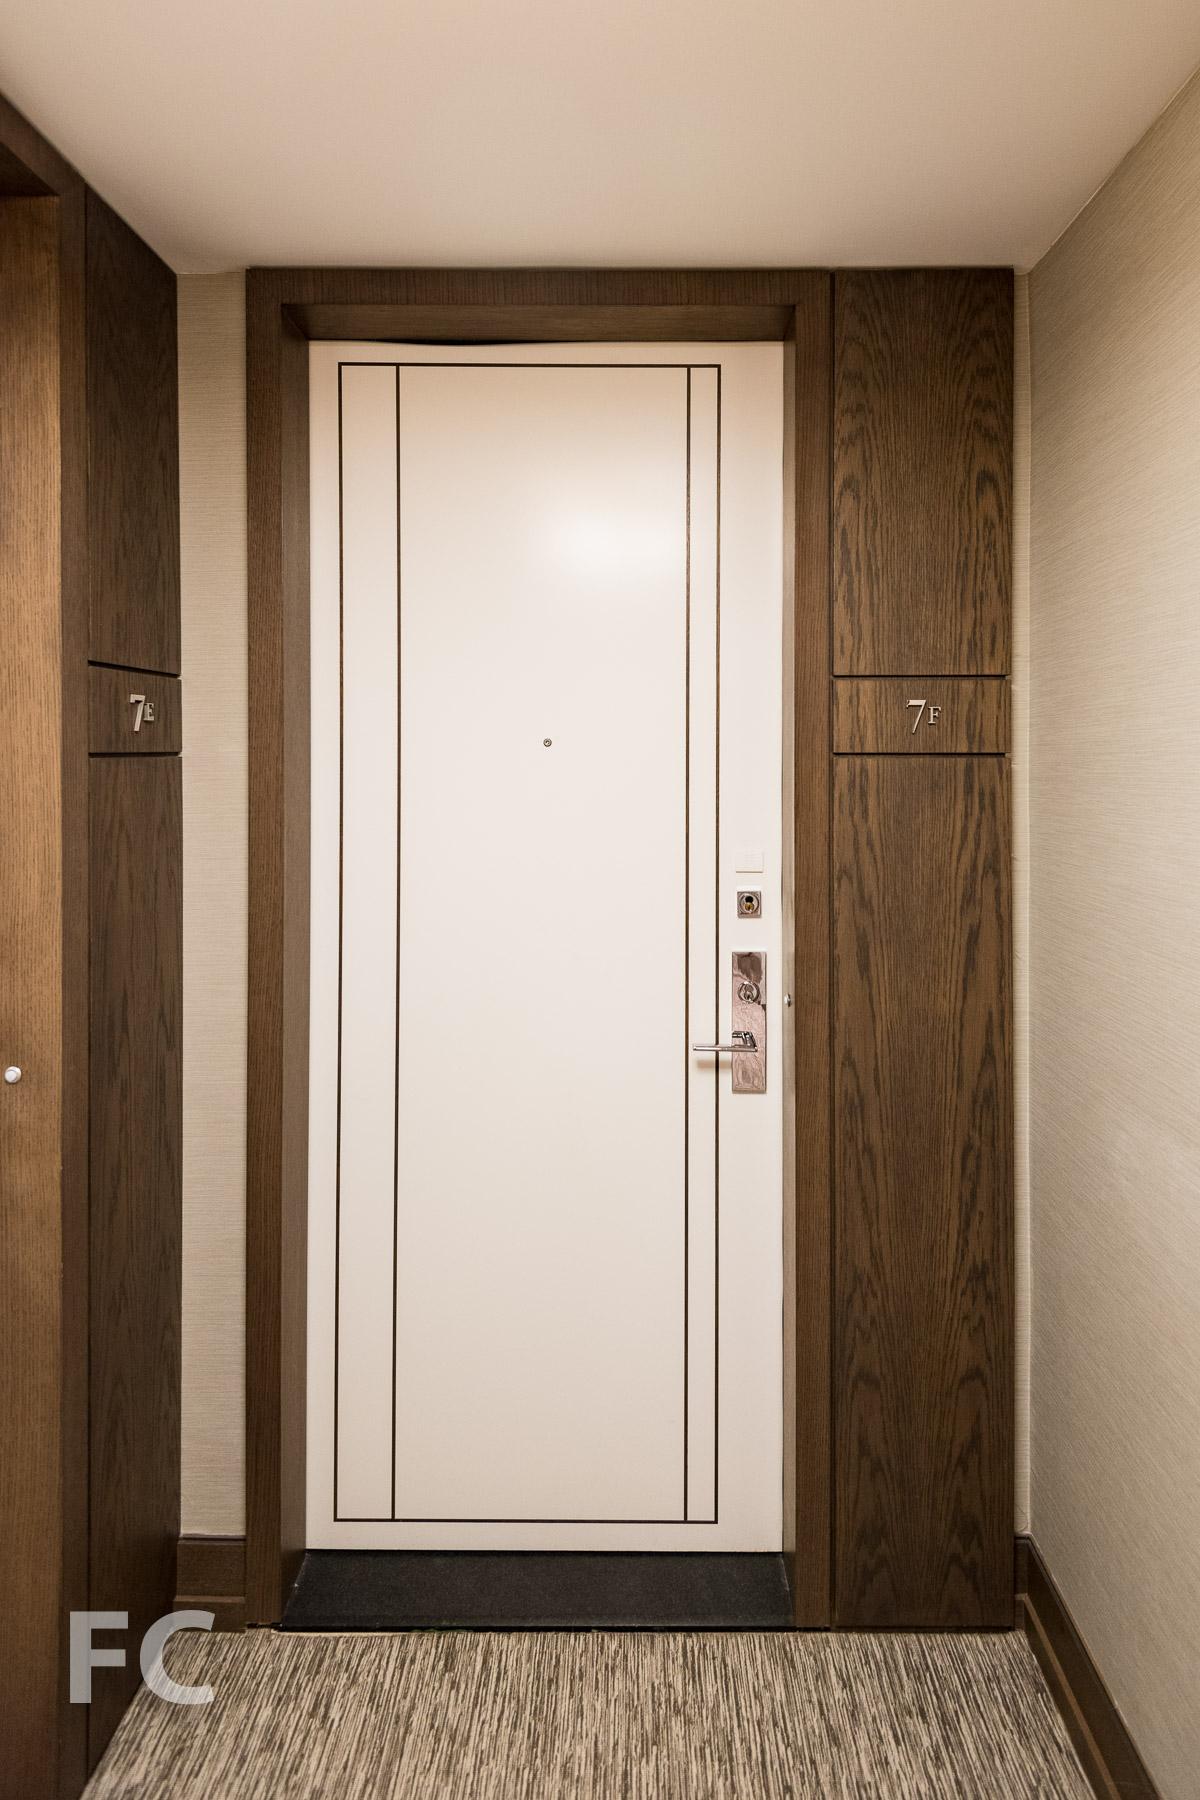 Residential entry.